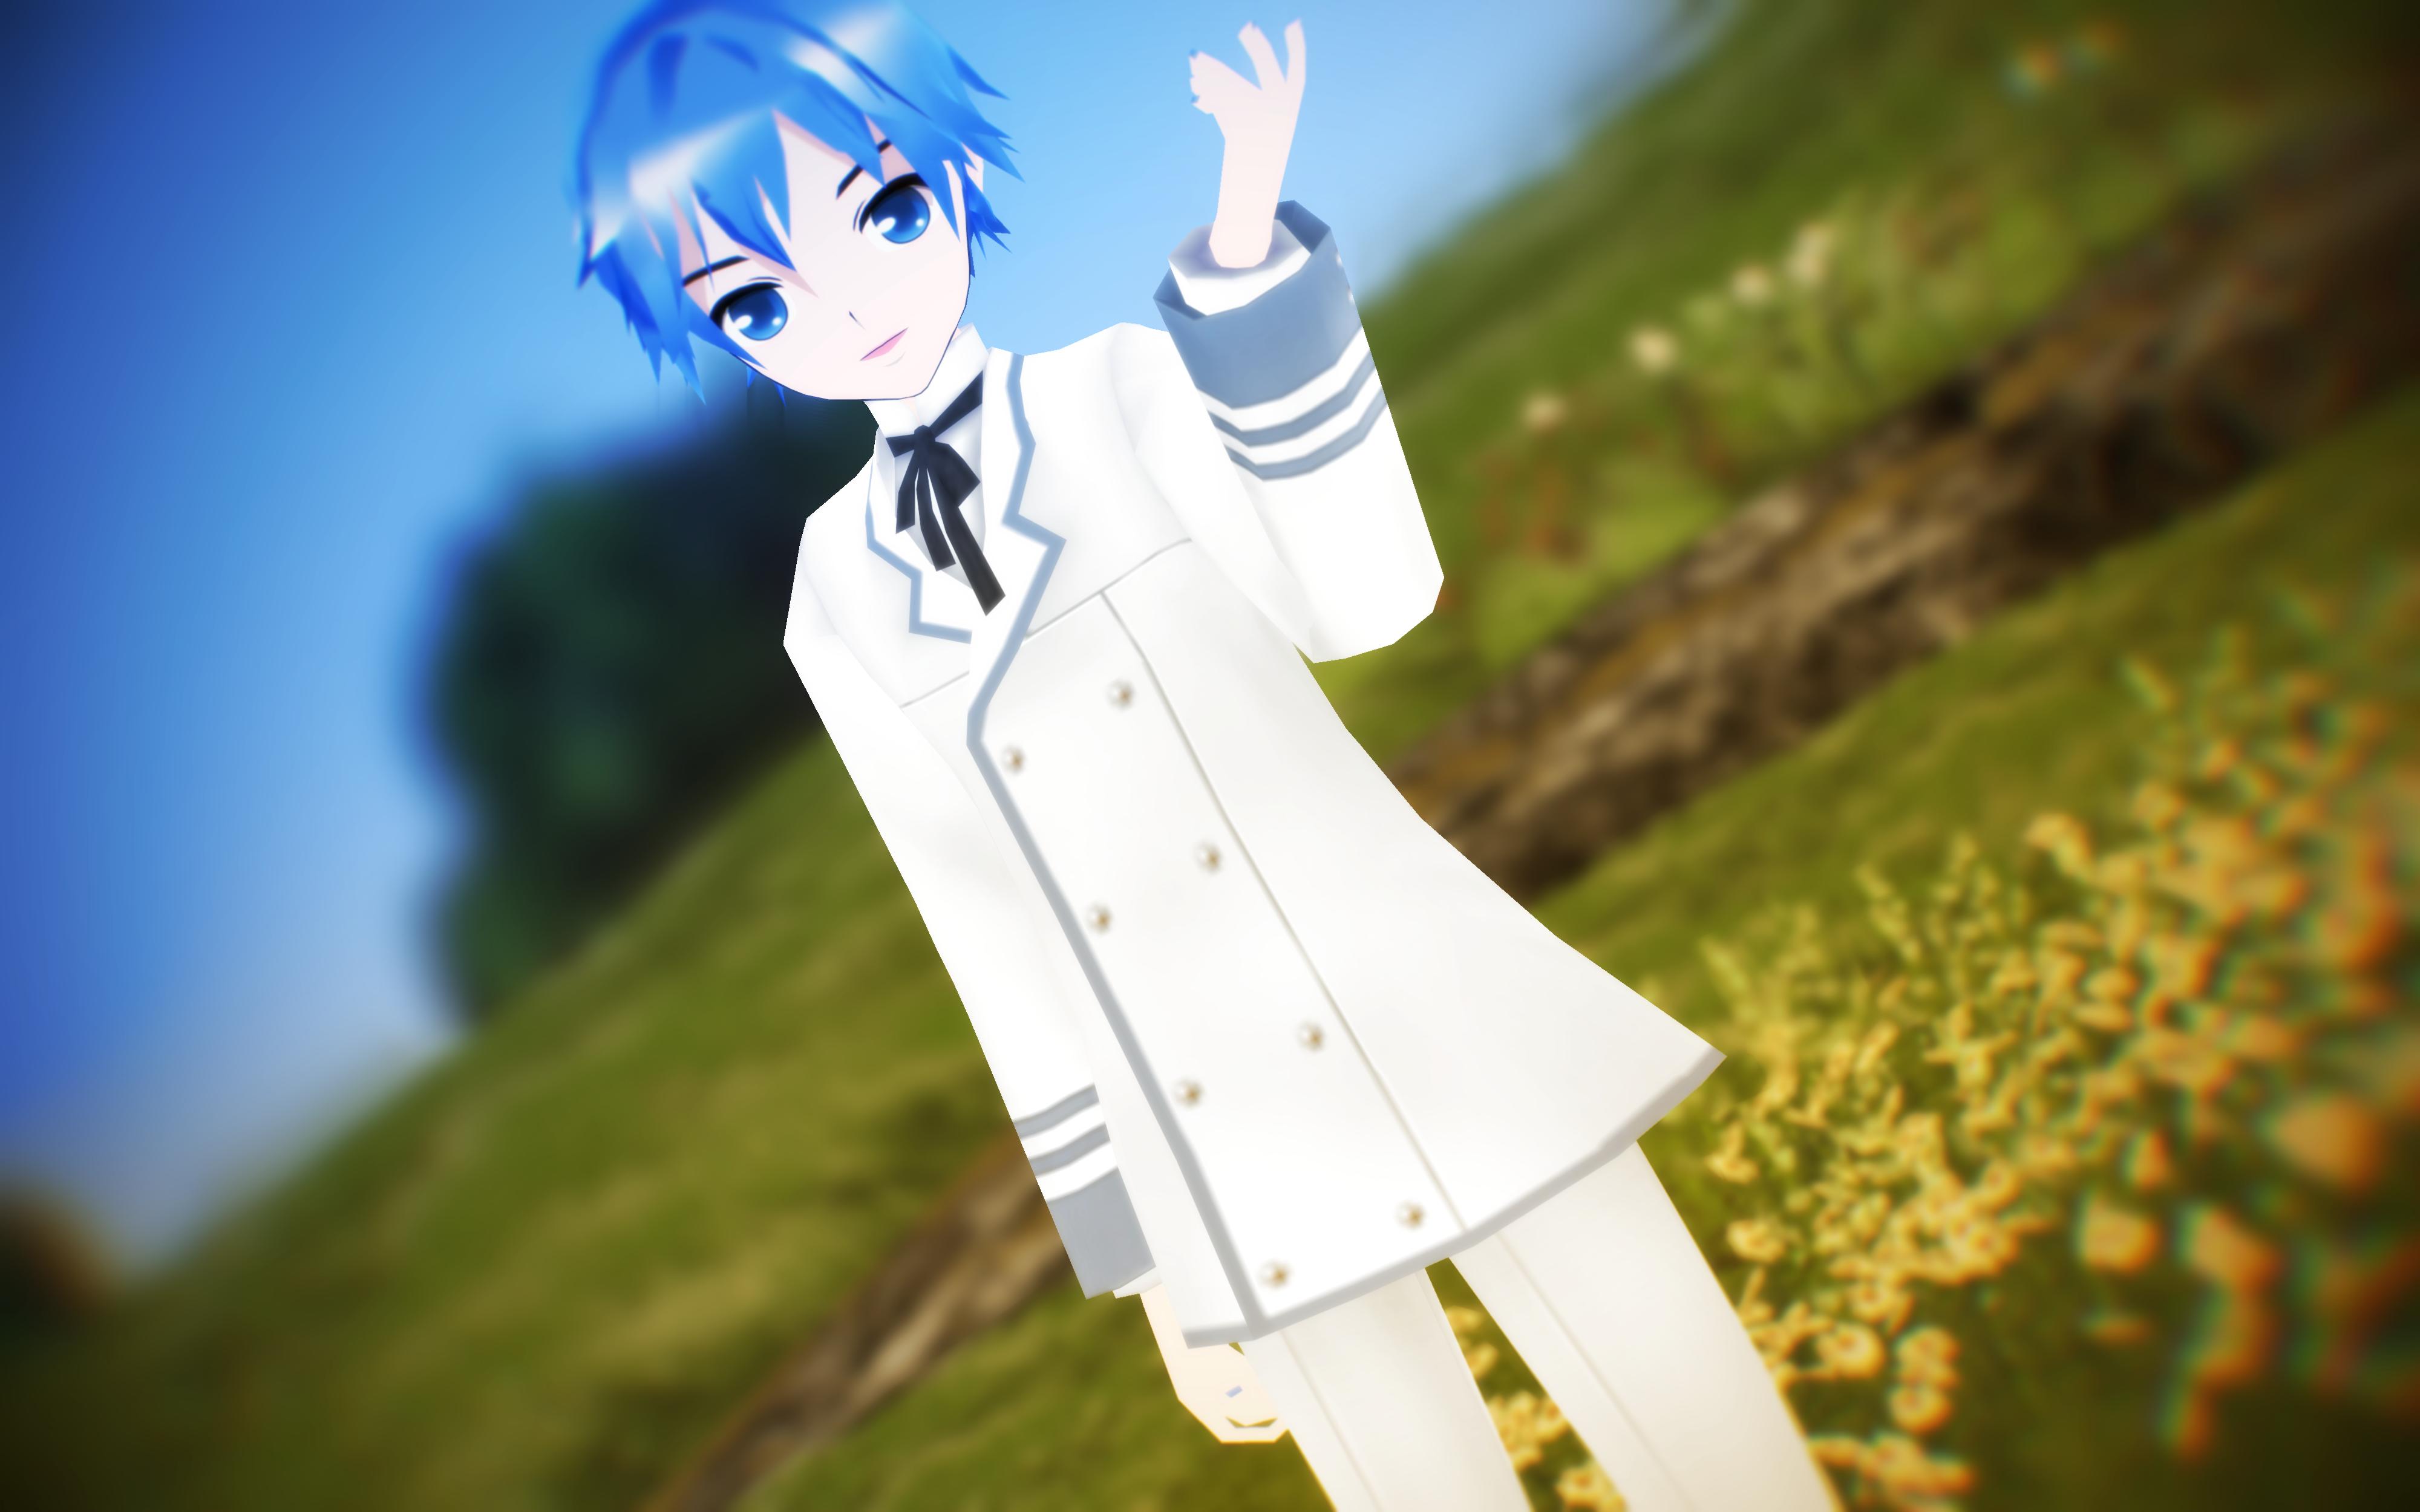 LAT White Blazer Kaito DOWNLOAD by MMDLADDyBoi003